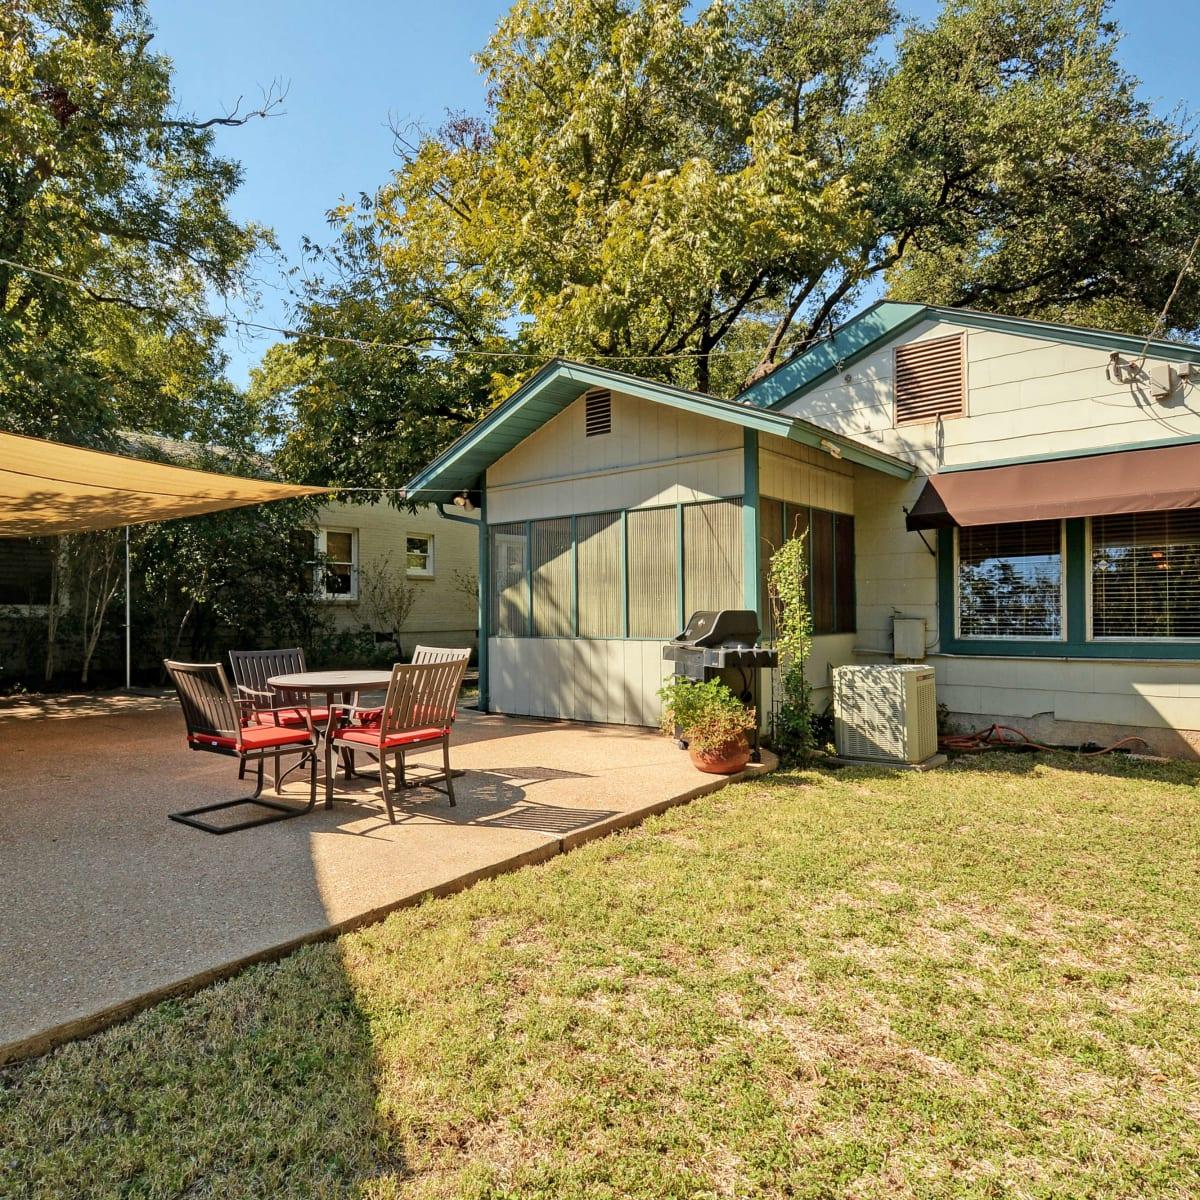 Alta Vista Austin home for sale back exterior